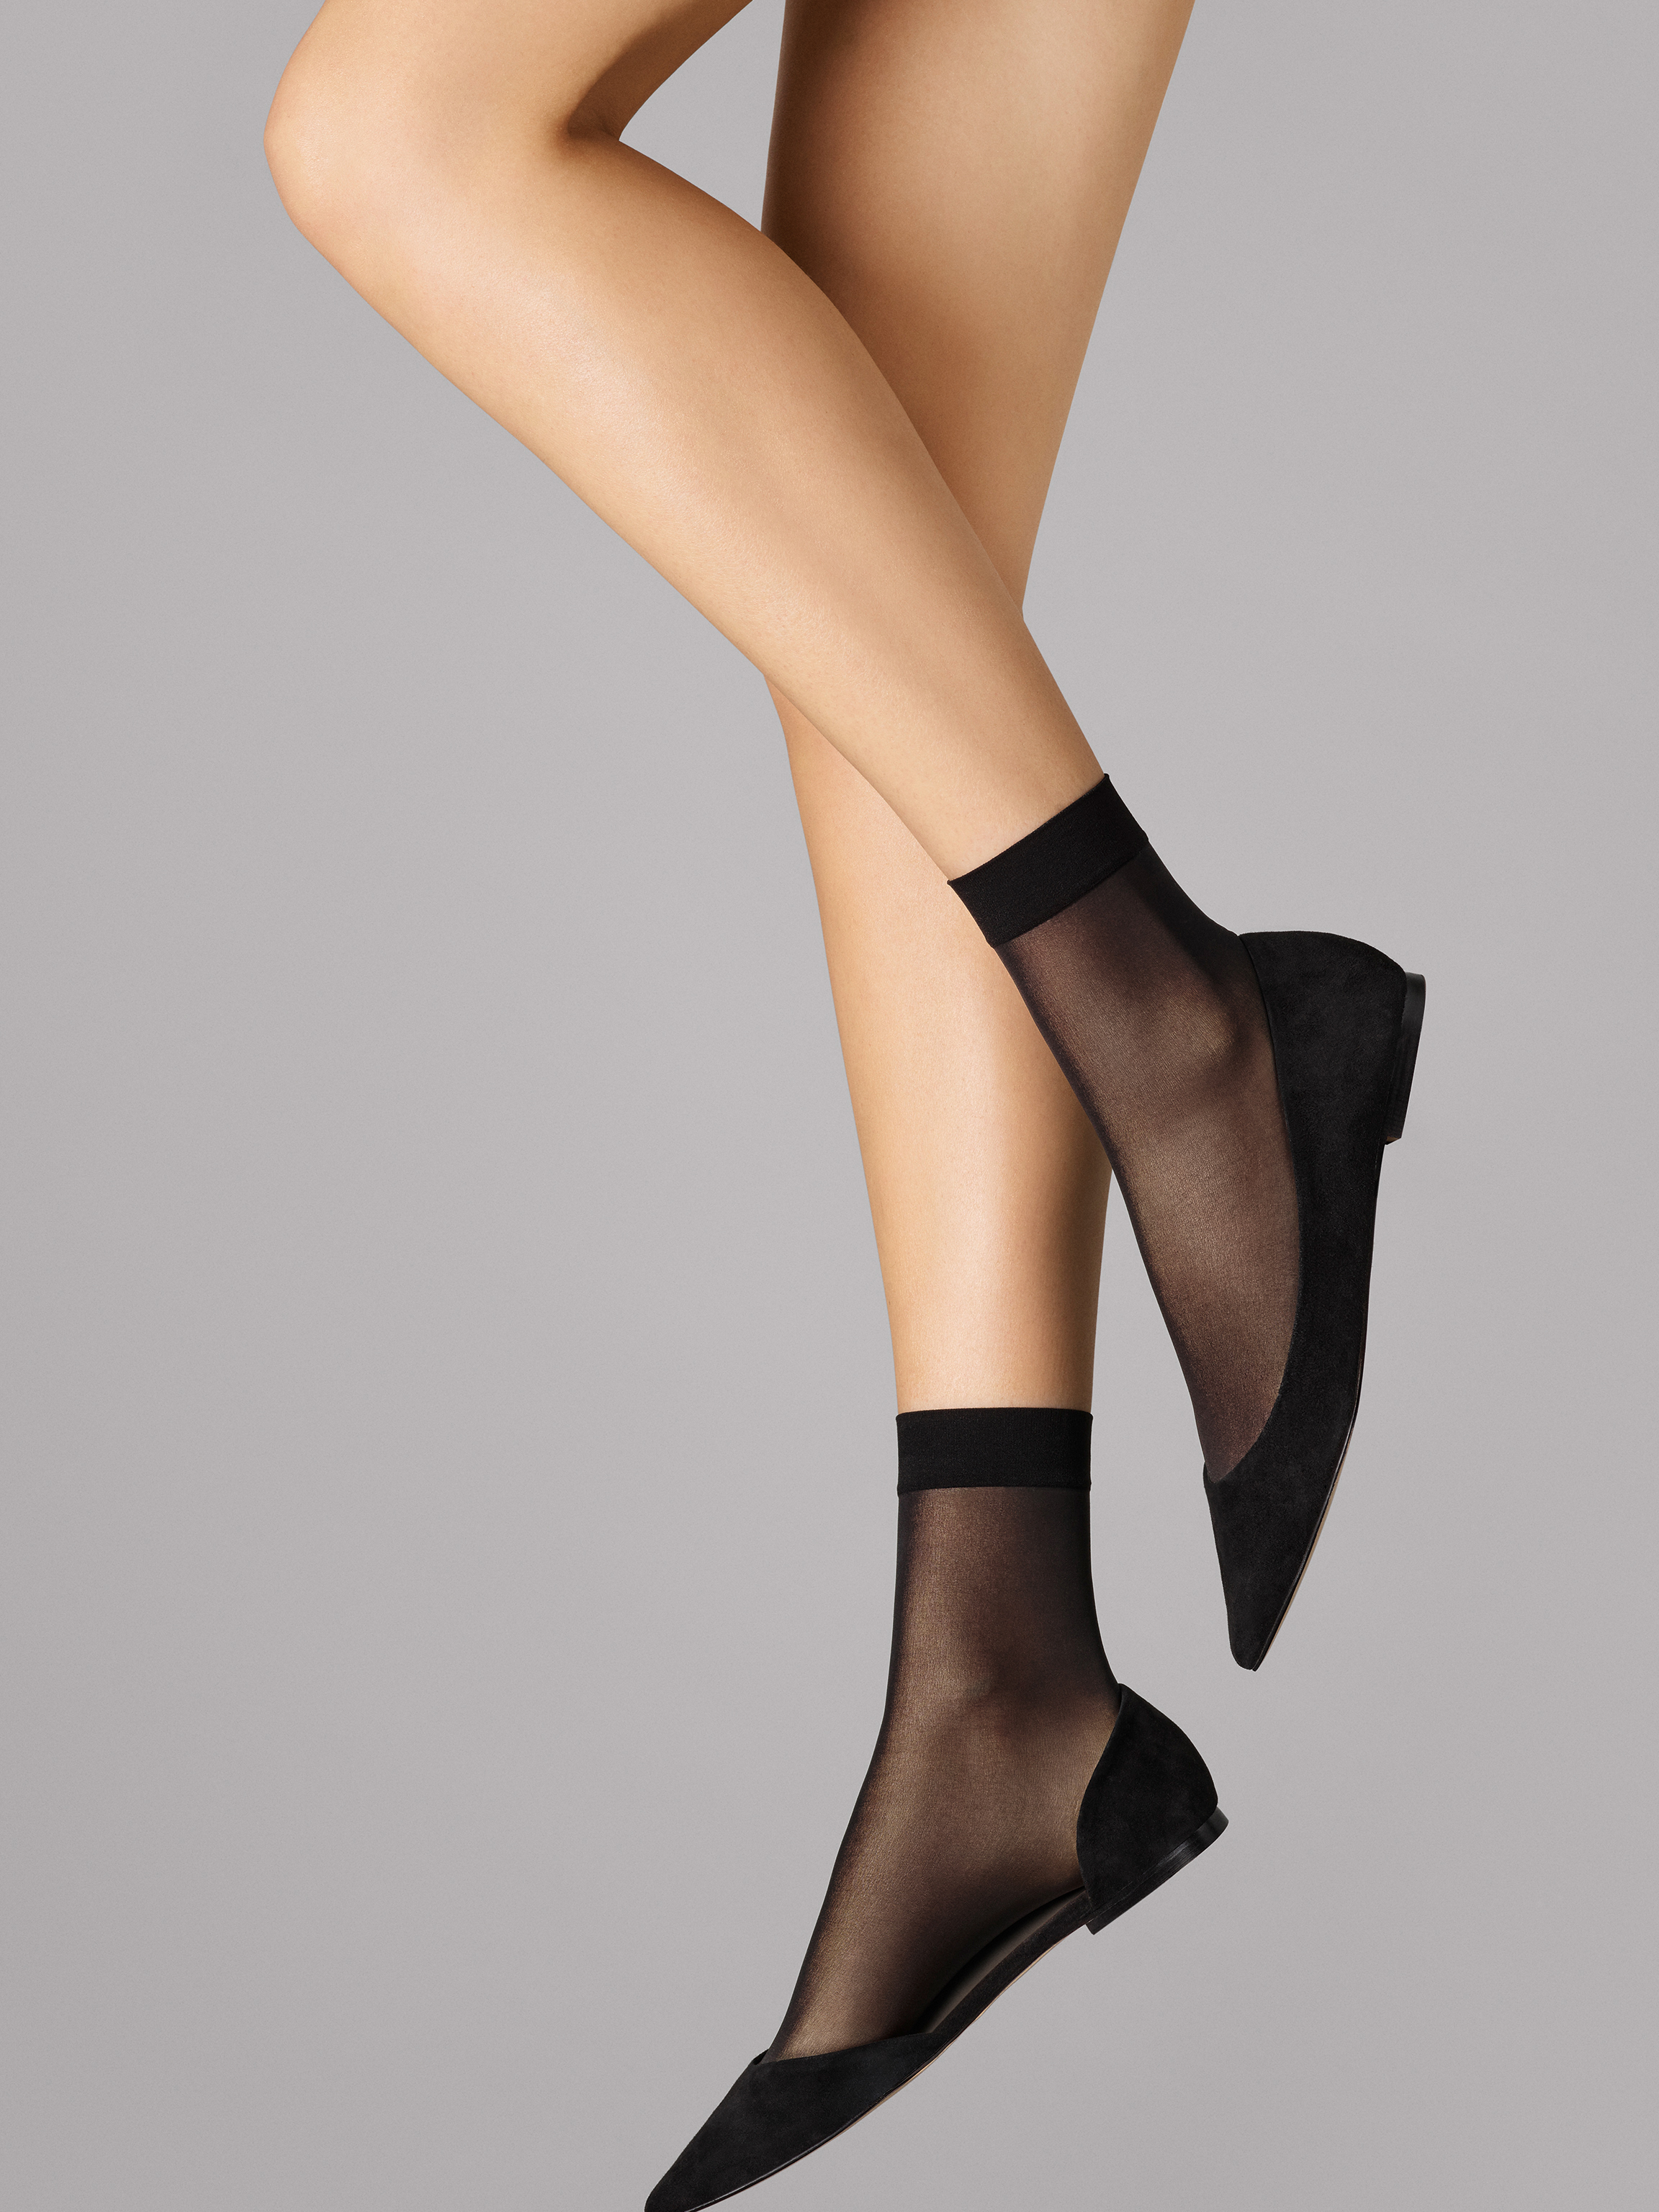 Individual 10 Socks